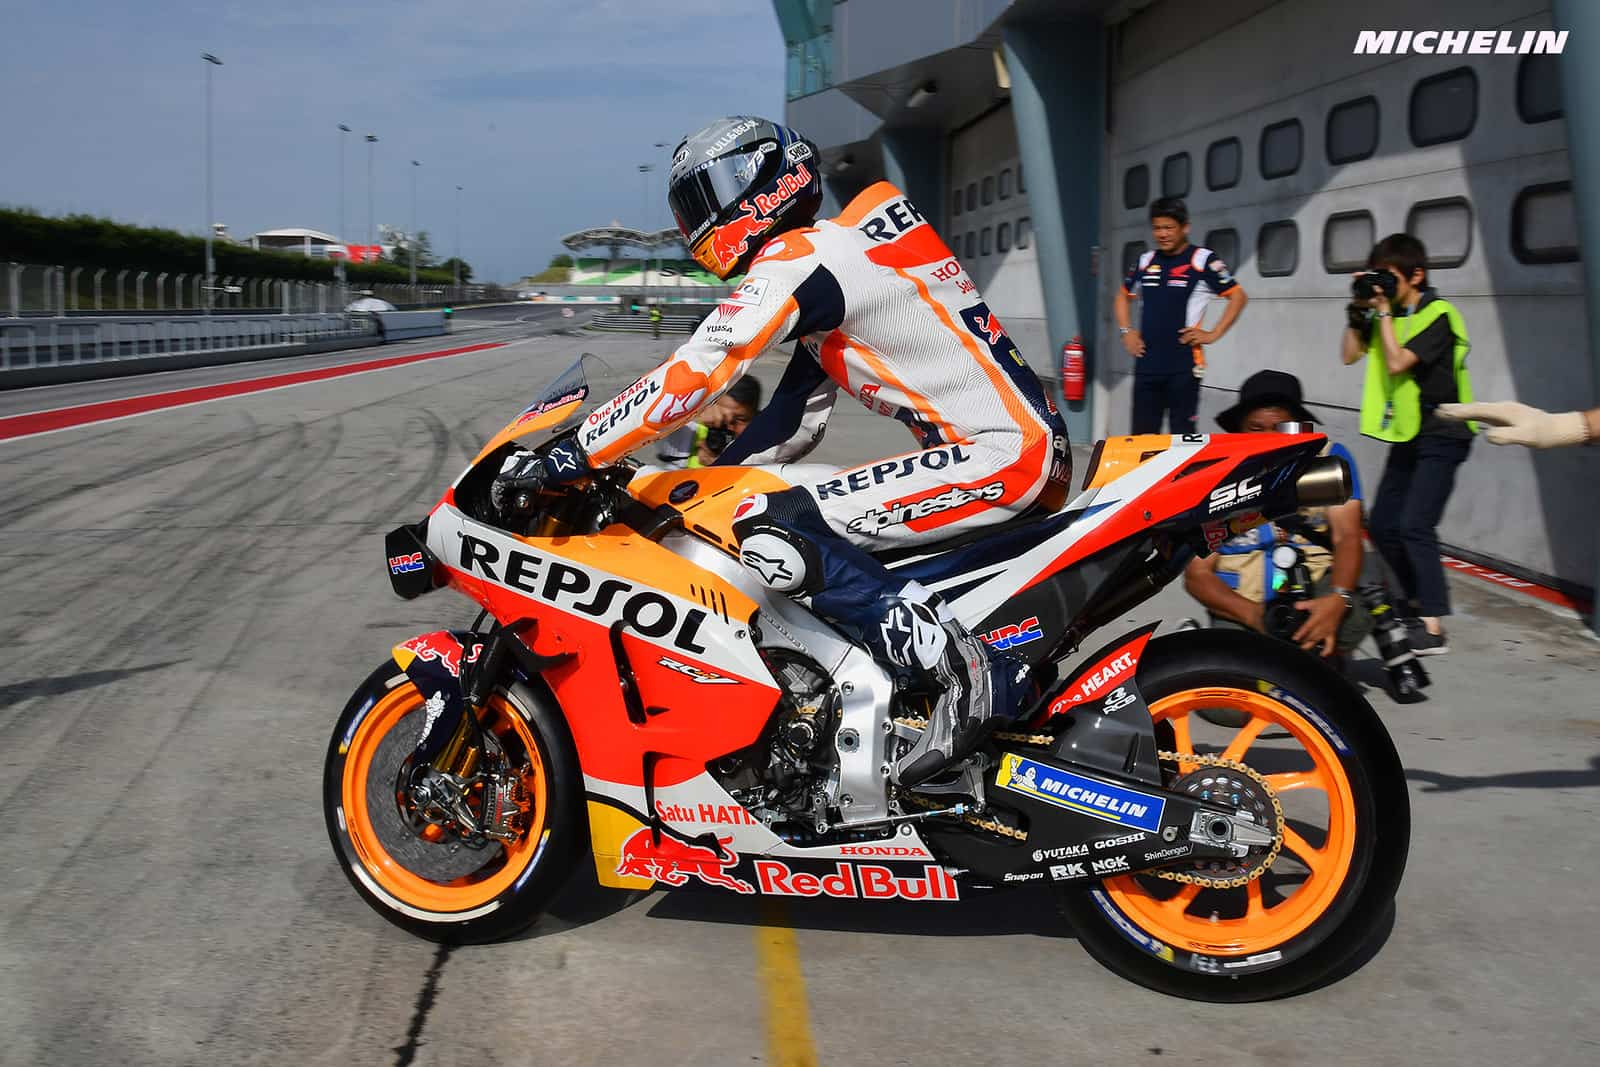 MotoGP 各メーカーの車両ホモロゲーション認証をリモートで進めると発表